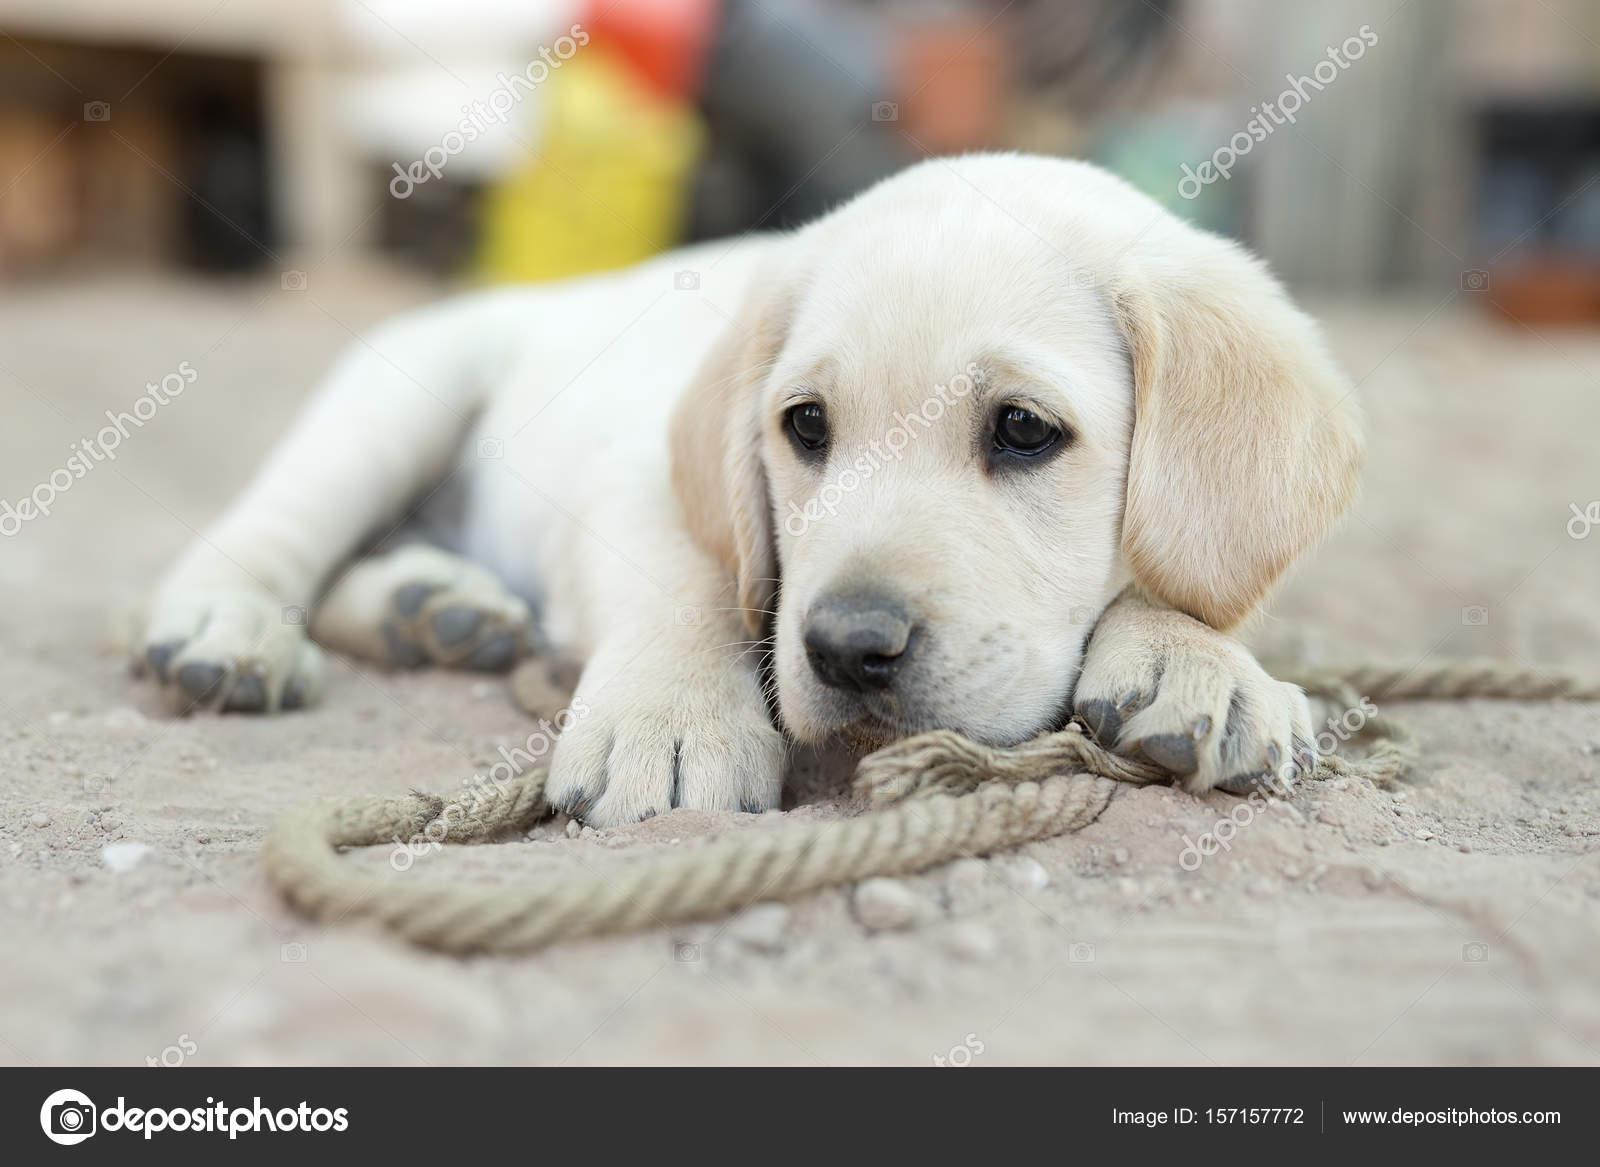 Portrait Of Small Golden Retriever Puppy Stock Photo C Francisgonsa 157157772